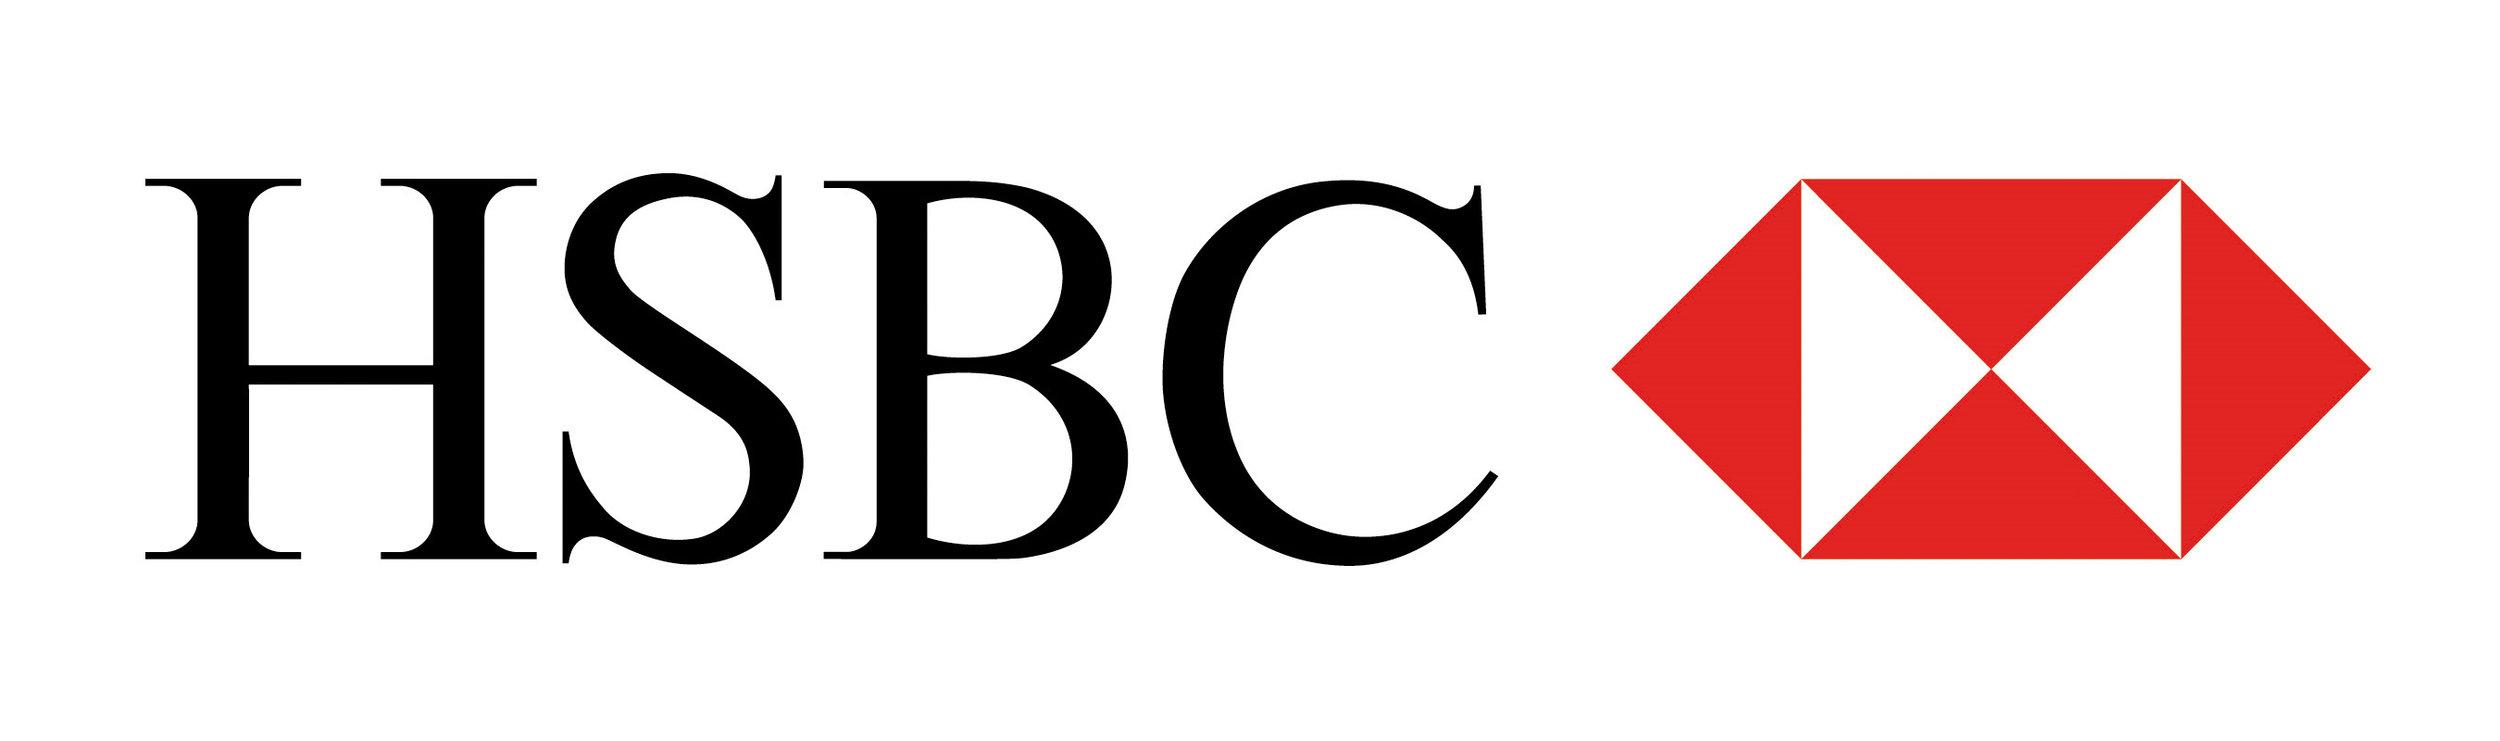 HSBC-symbol.jpg